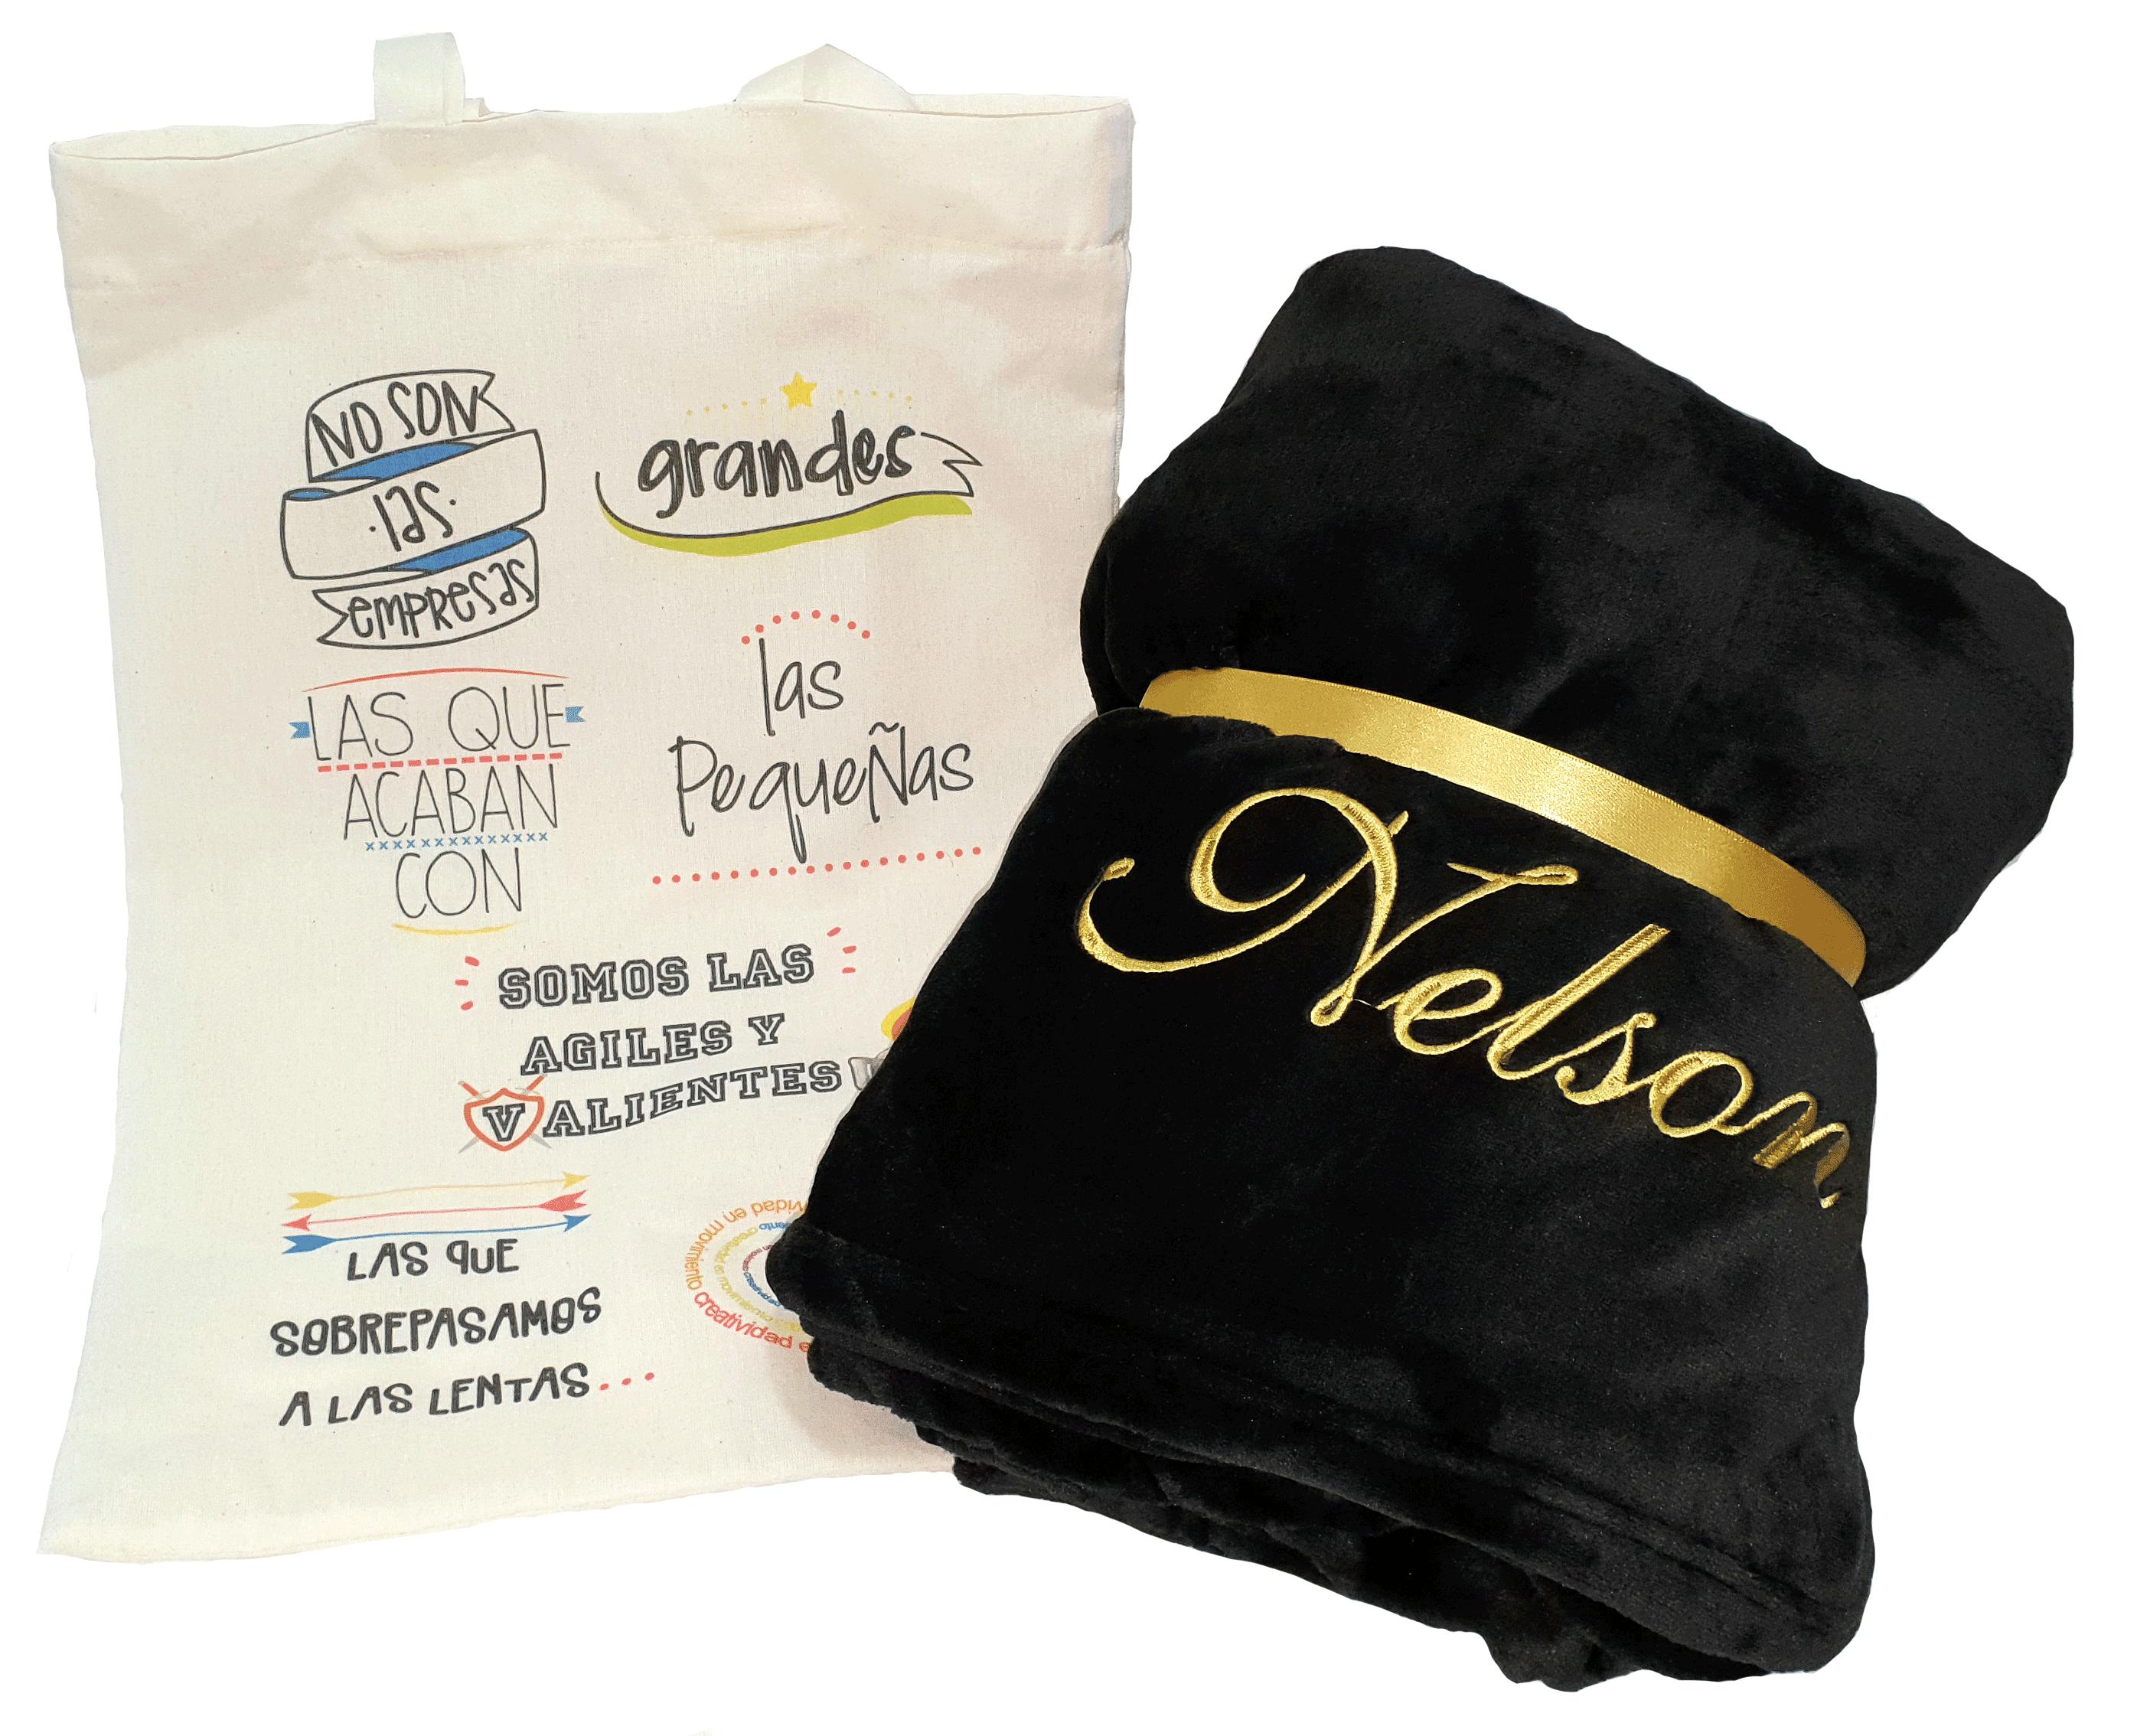 Cobijas personalizadas para regalos, marcas, eventos.